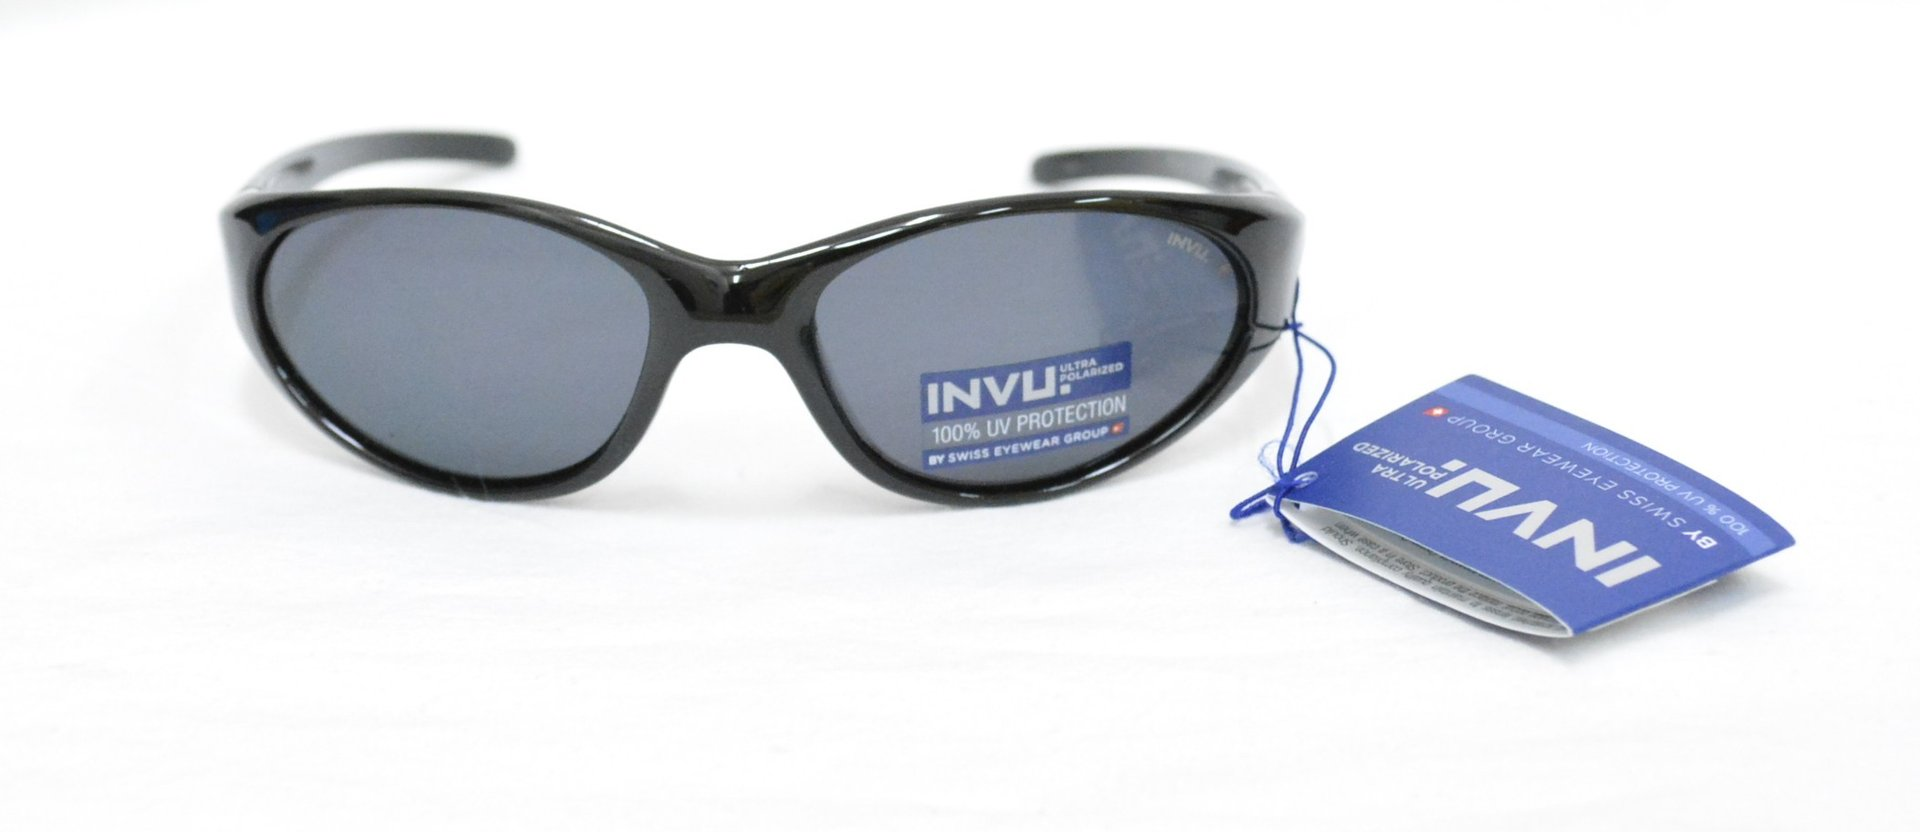 7d5445c7992 Sunglasses INVU K 2408 A BLACK LENSES POLARIZED - OTTICA TRAINA Eyewear Invu  ...